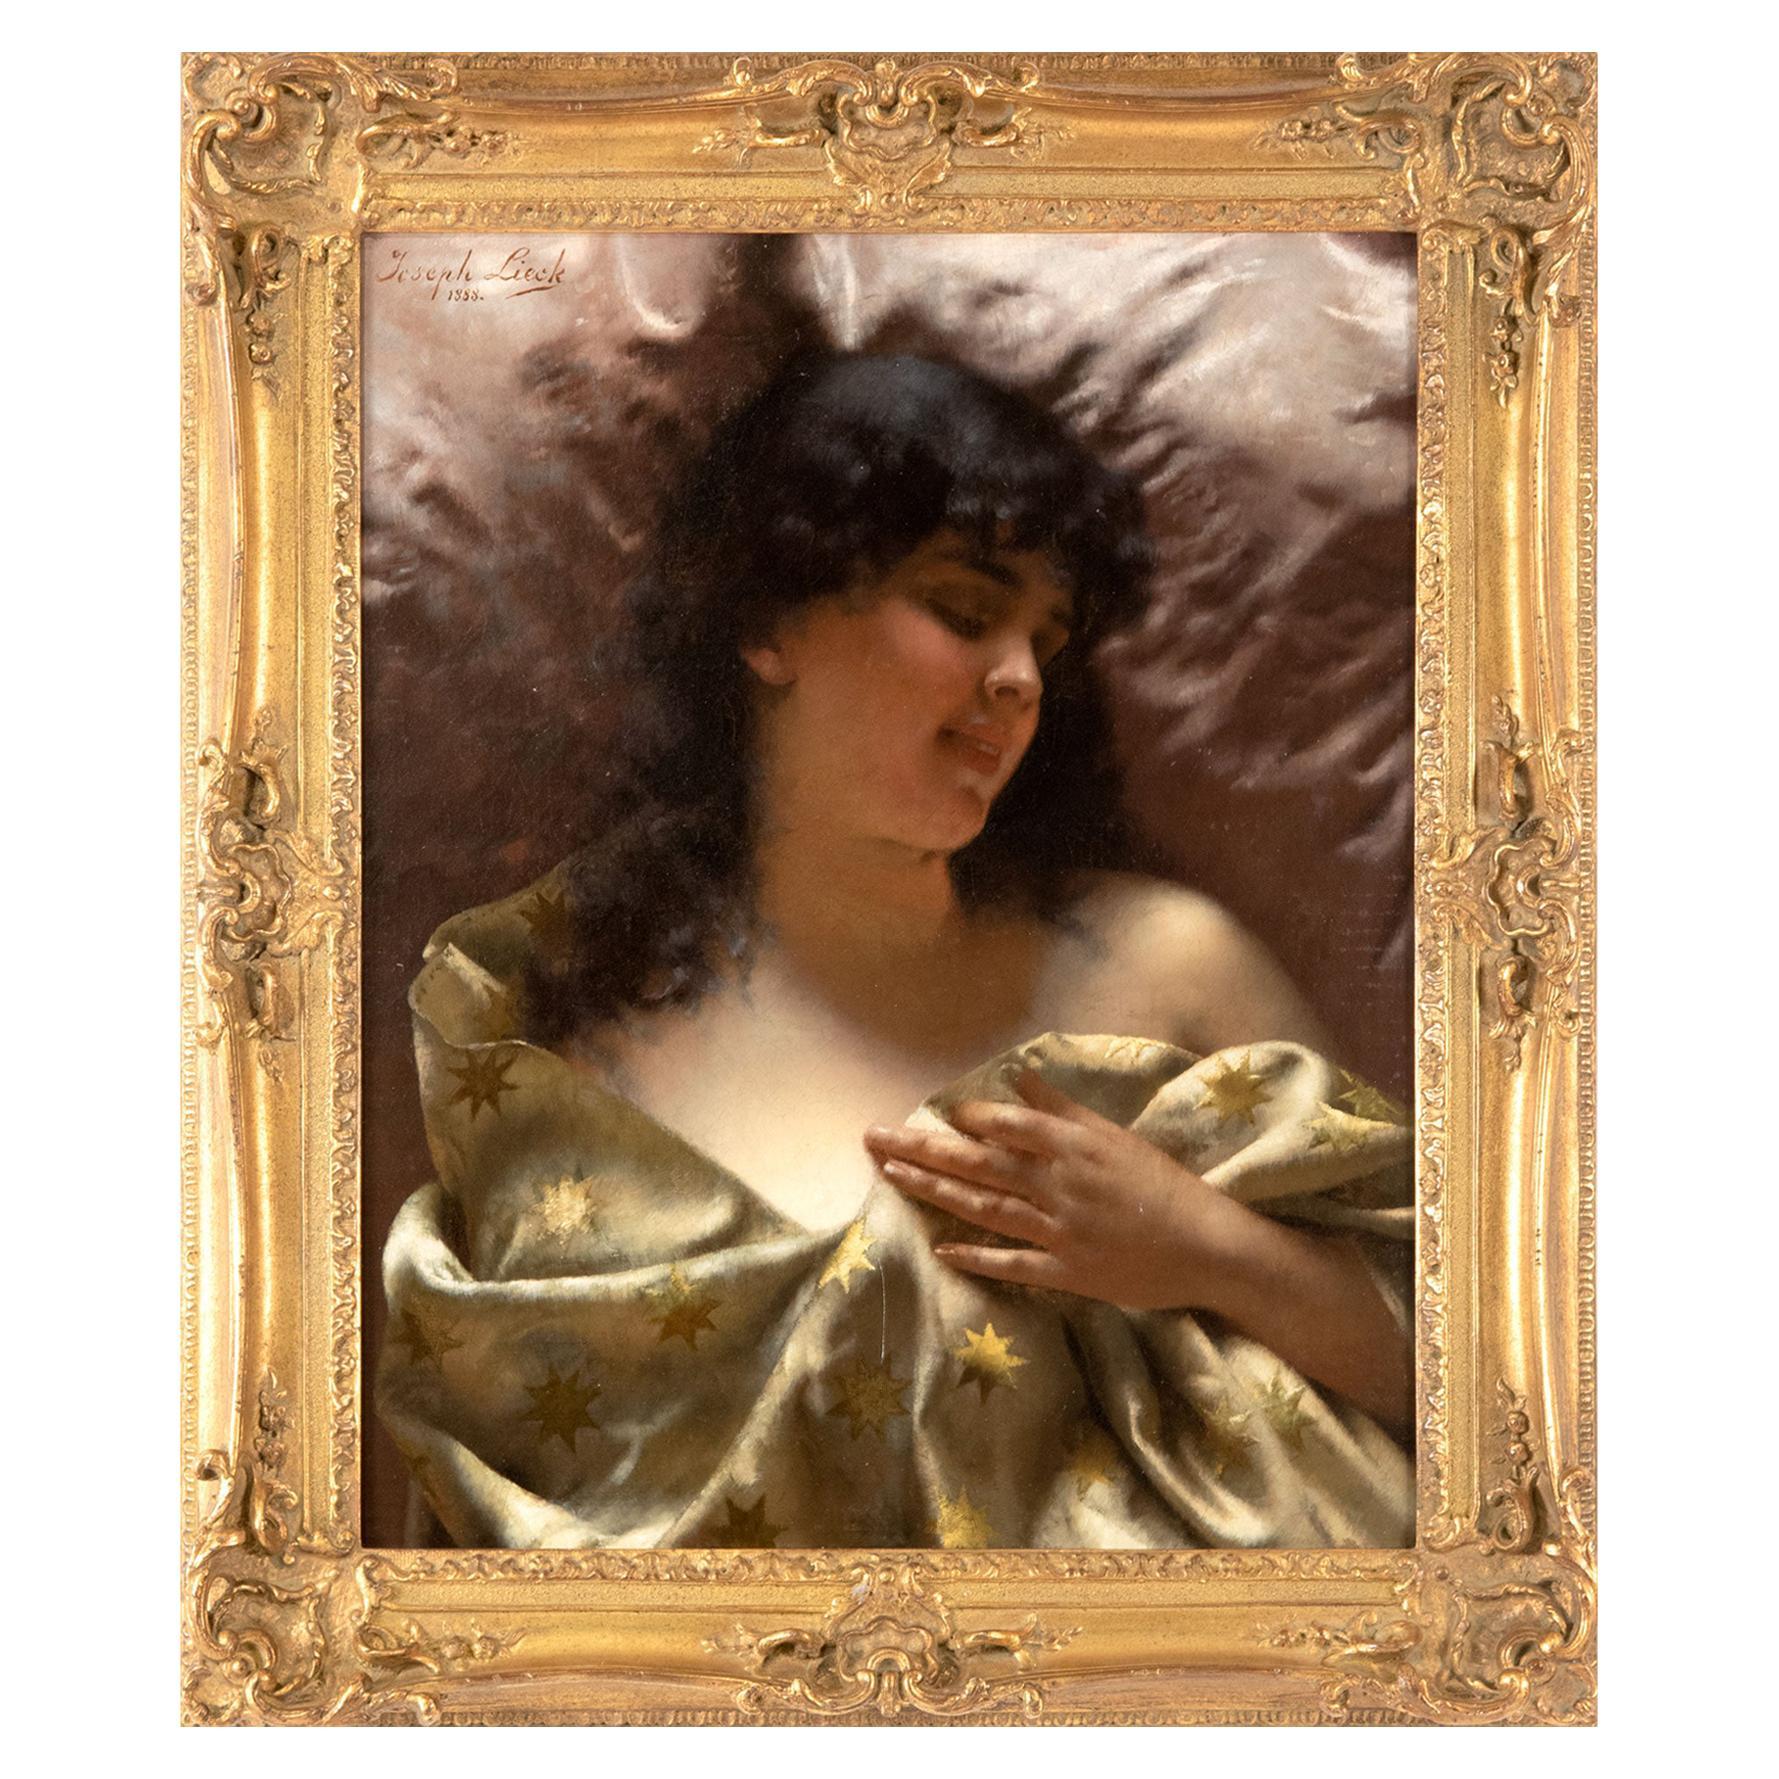 Sleeping Beauty by Joseph Lieck